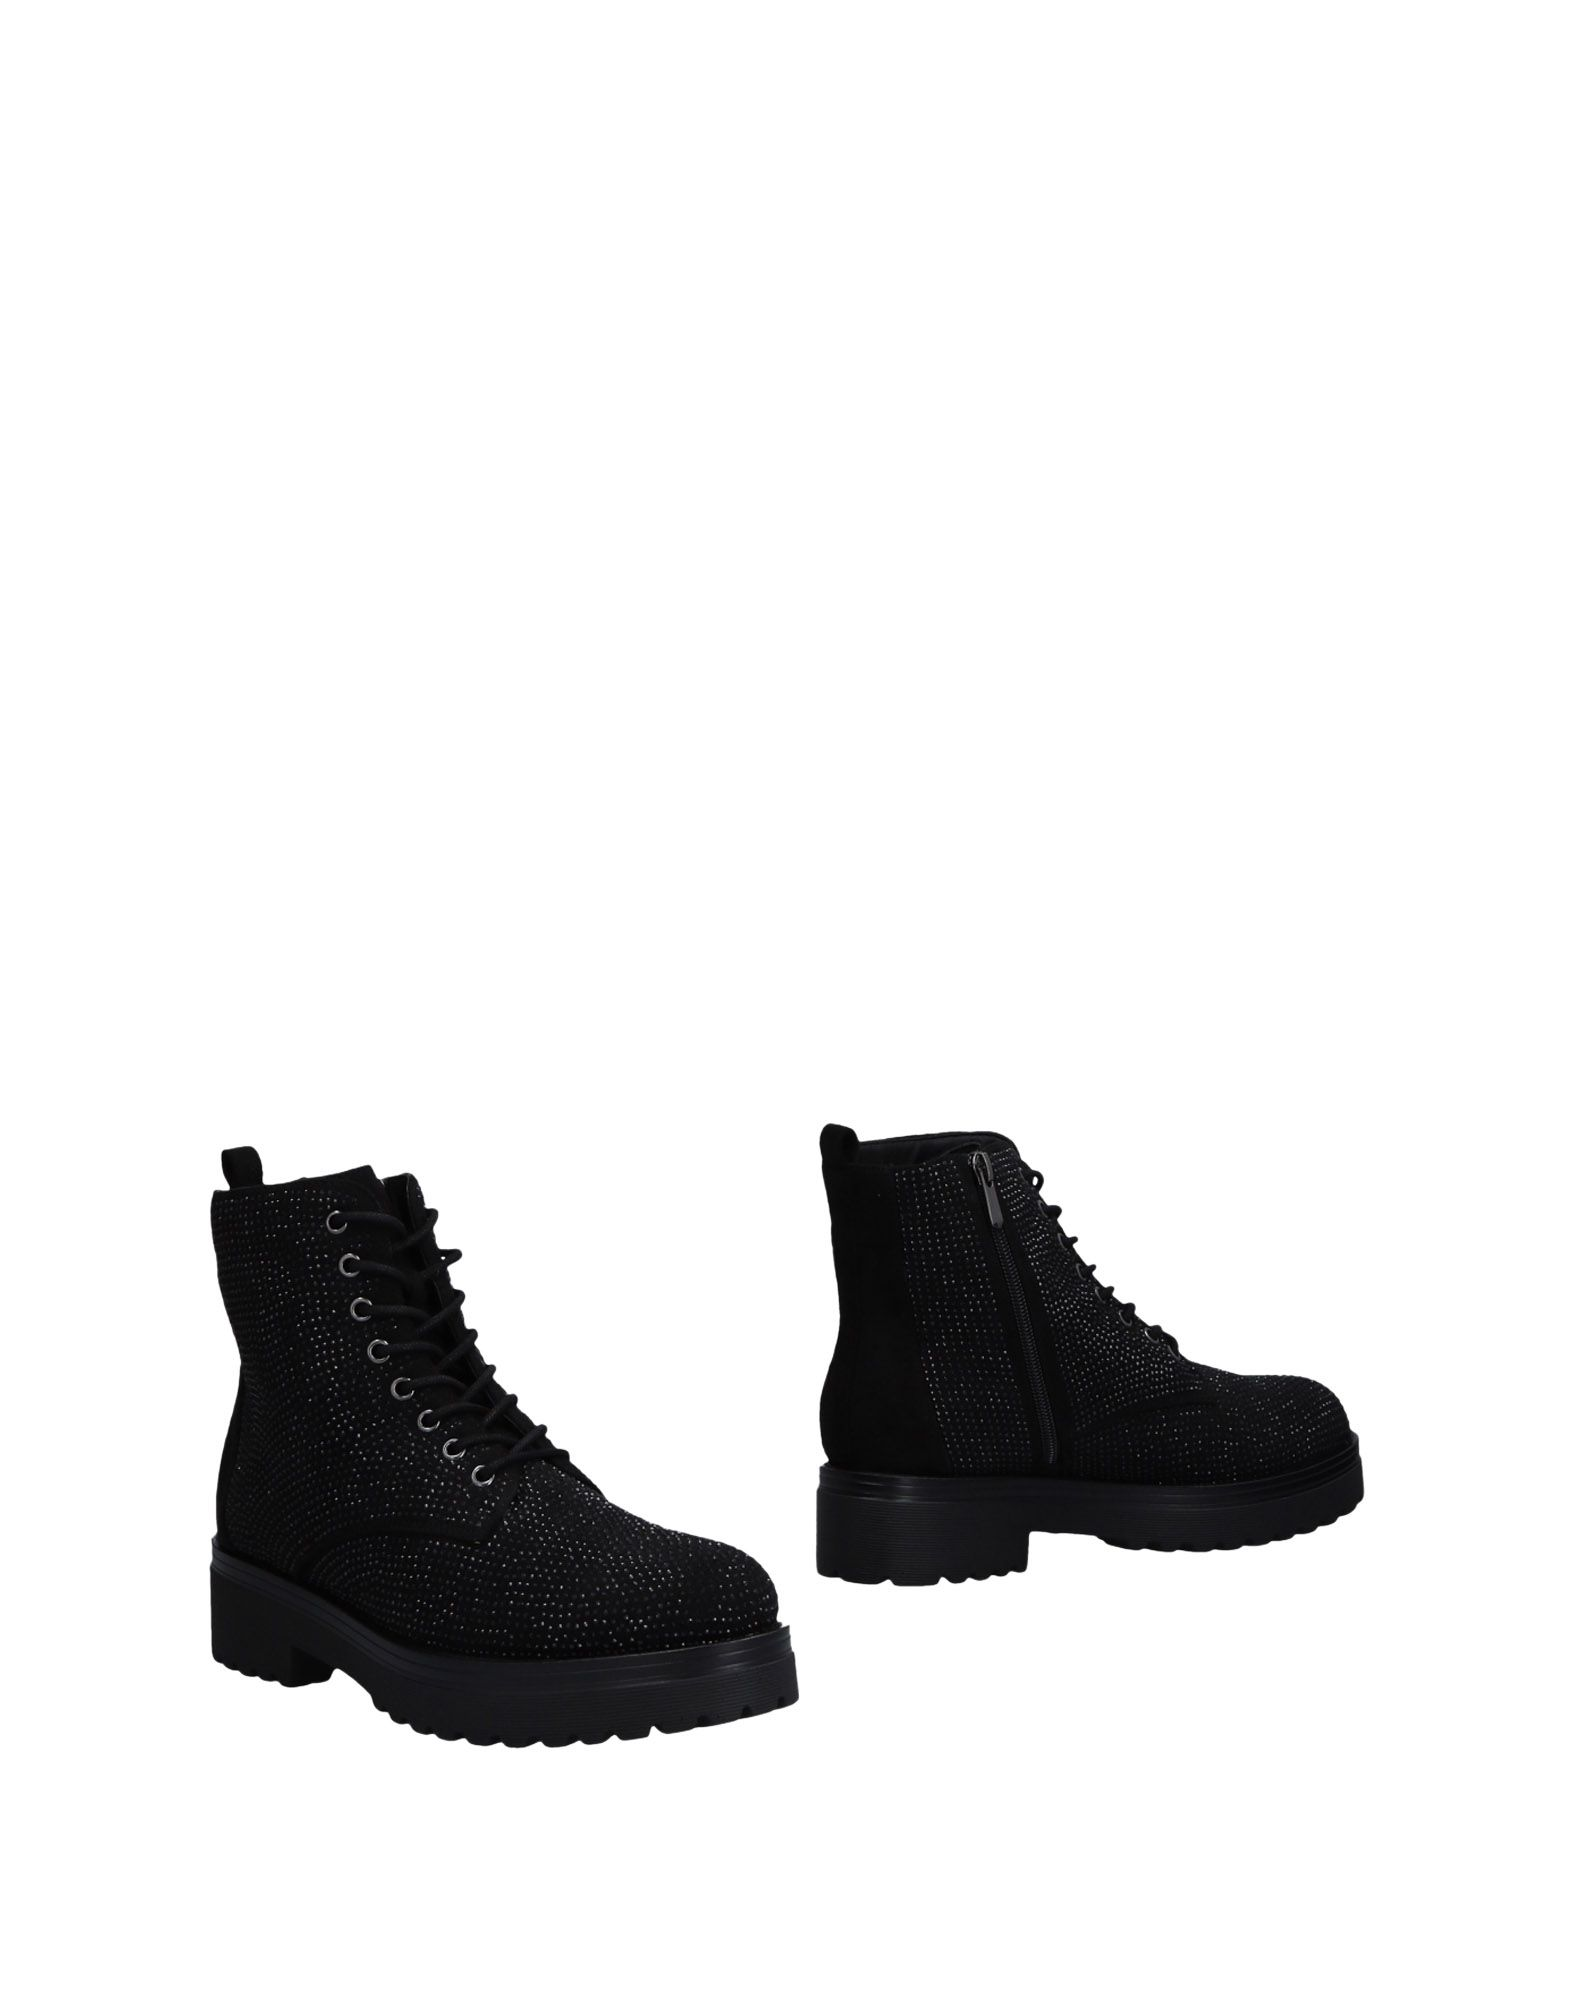 Cafènoir Stiefelette Damen  11478291NT Gute Qualität beliebte Schuhe